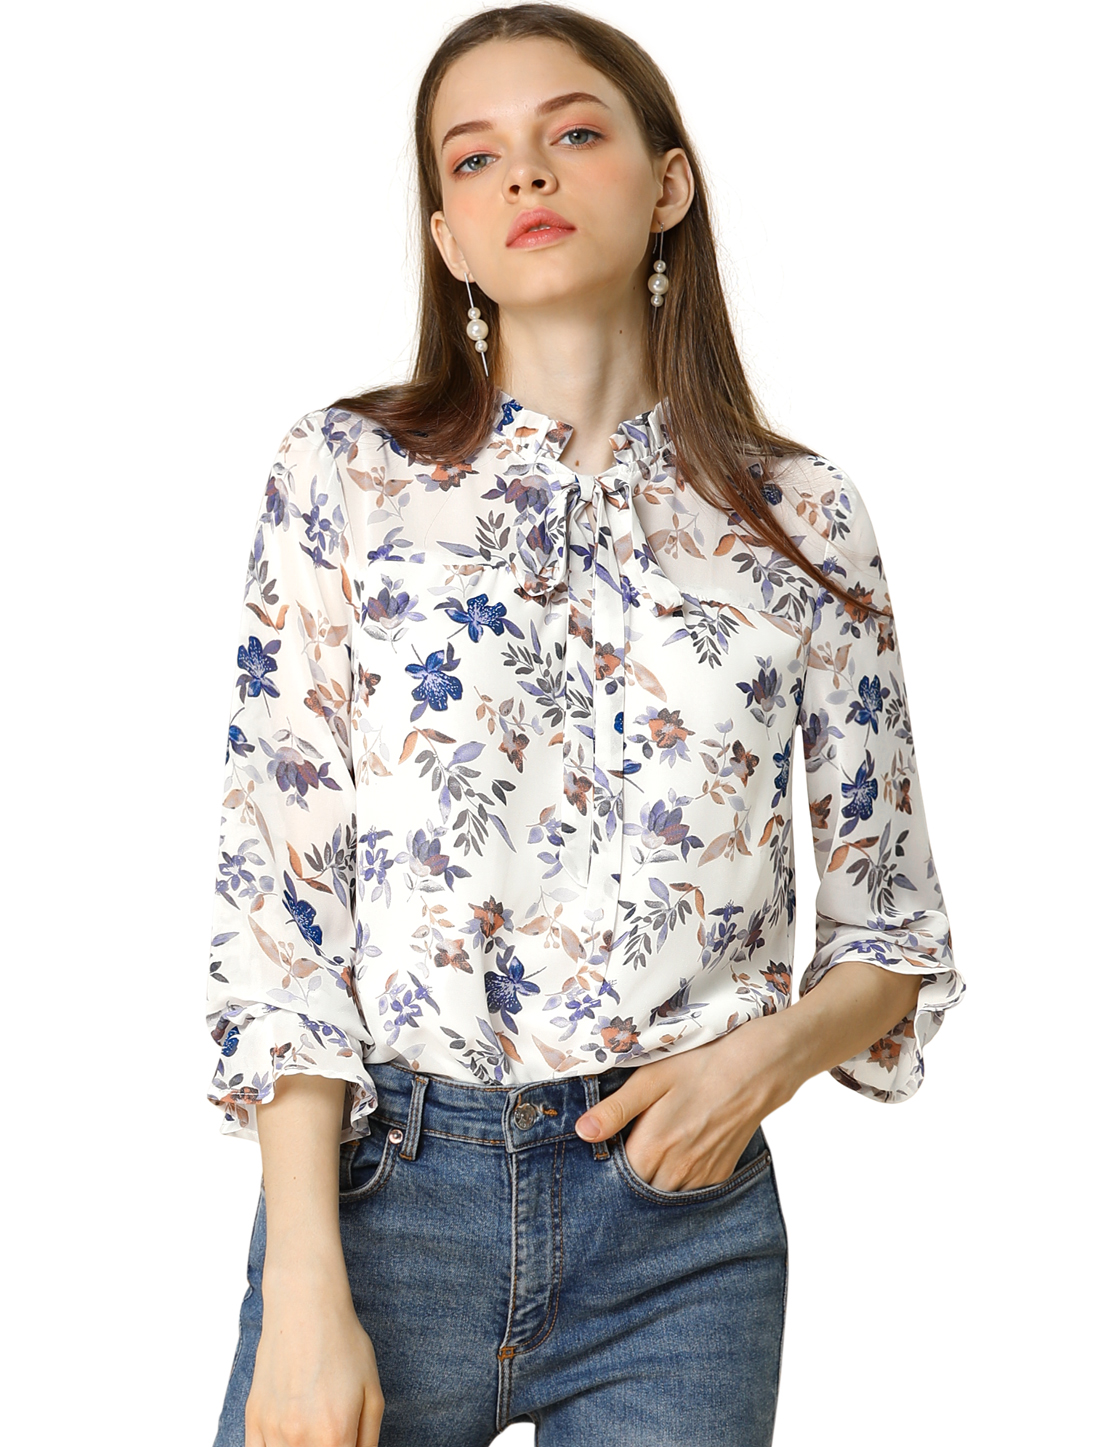 Allegra K Women's Long Sleeve Tie Neck Ruffle Collar Floral Print Top White L